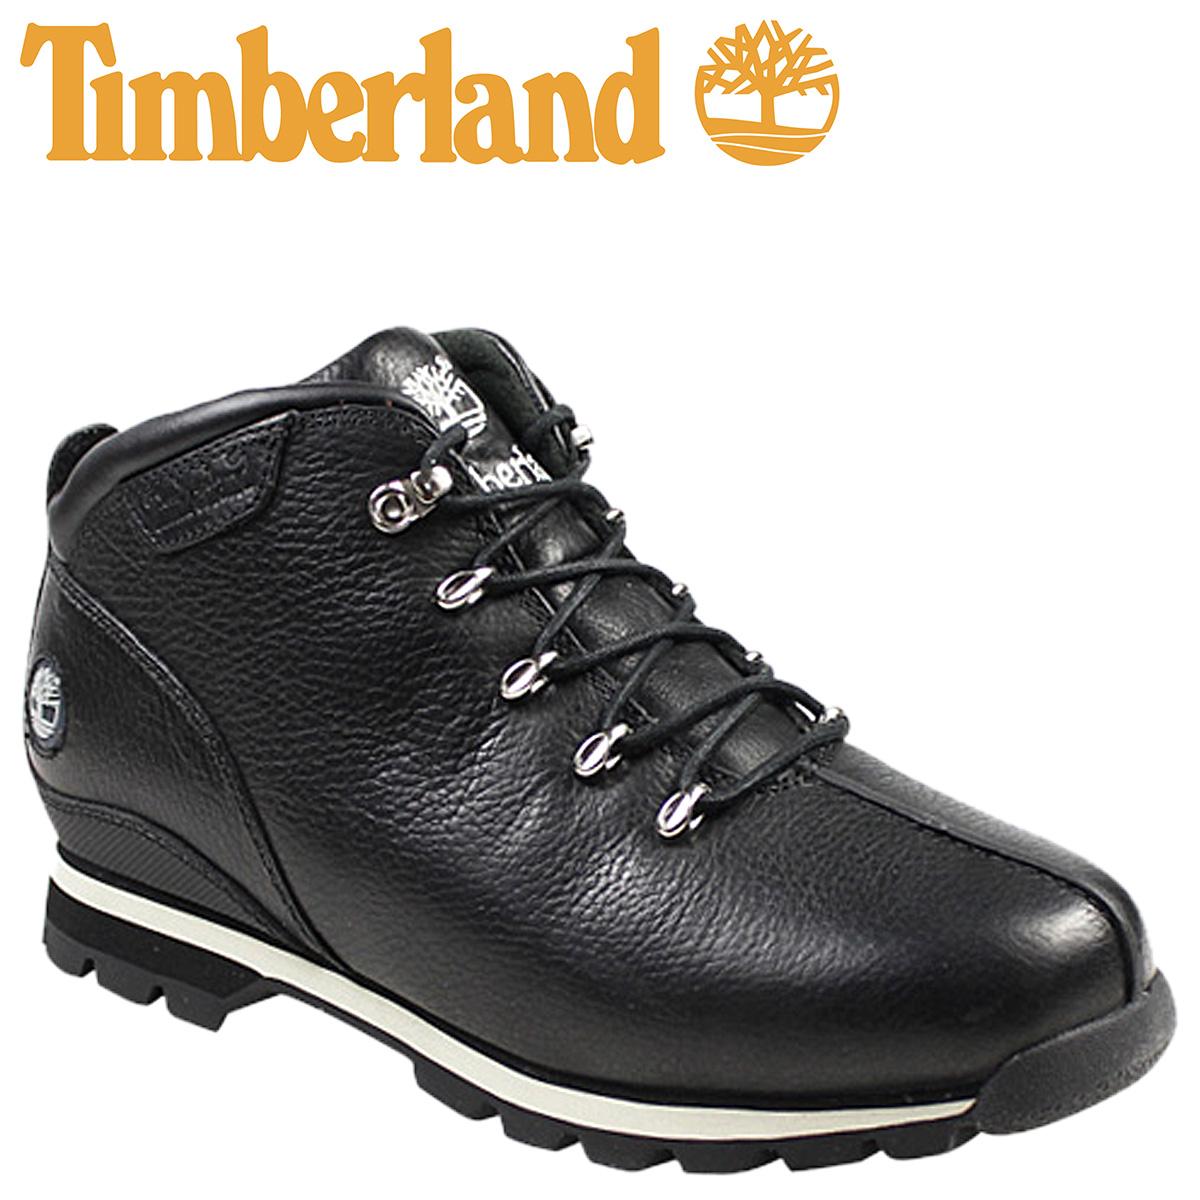 be6243aad7 Timberland Timberland split rock ankle boots leather SPLITROCK LEATHER  ANKLE BOOT nubuck mens 20599 black ...